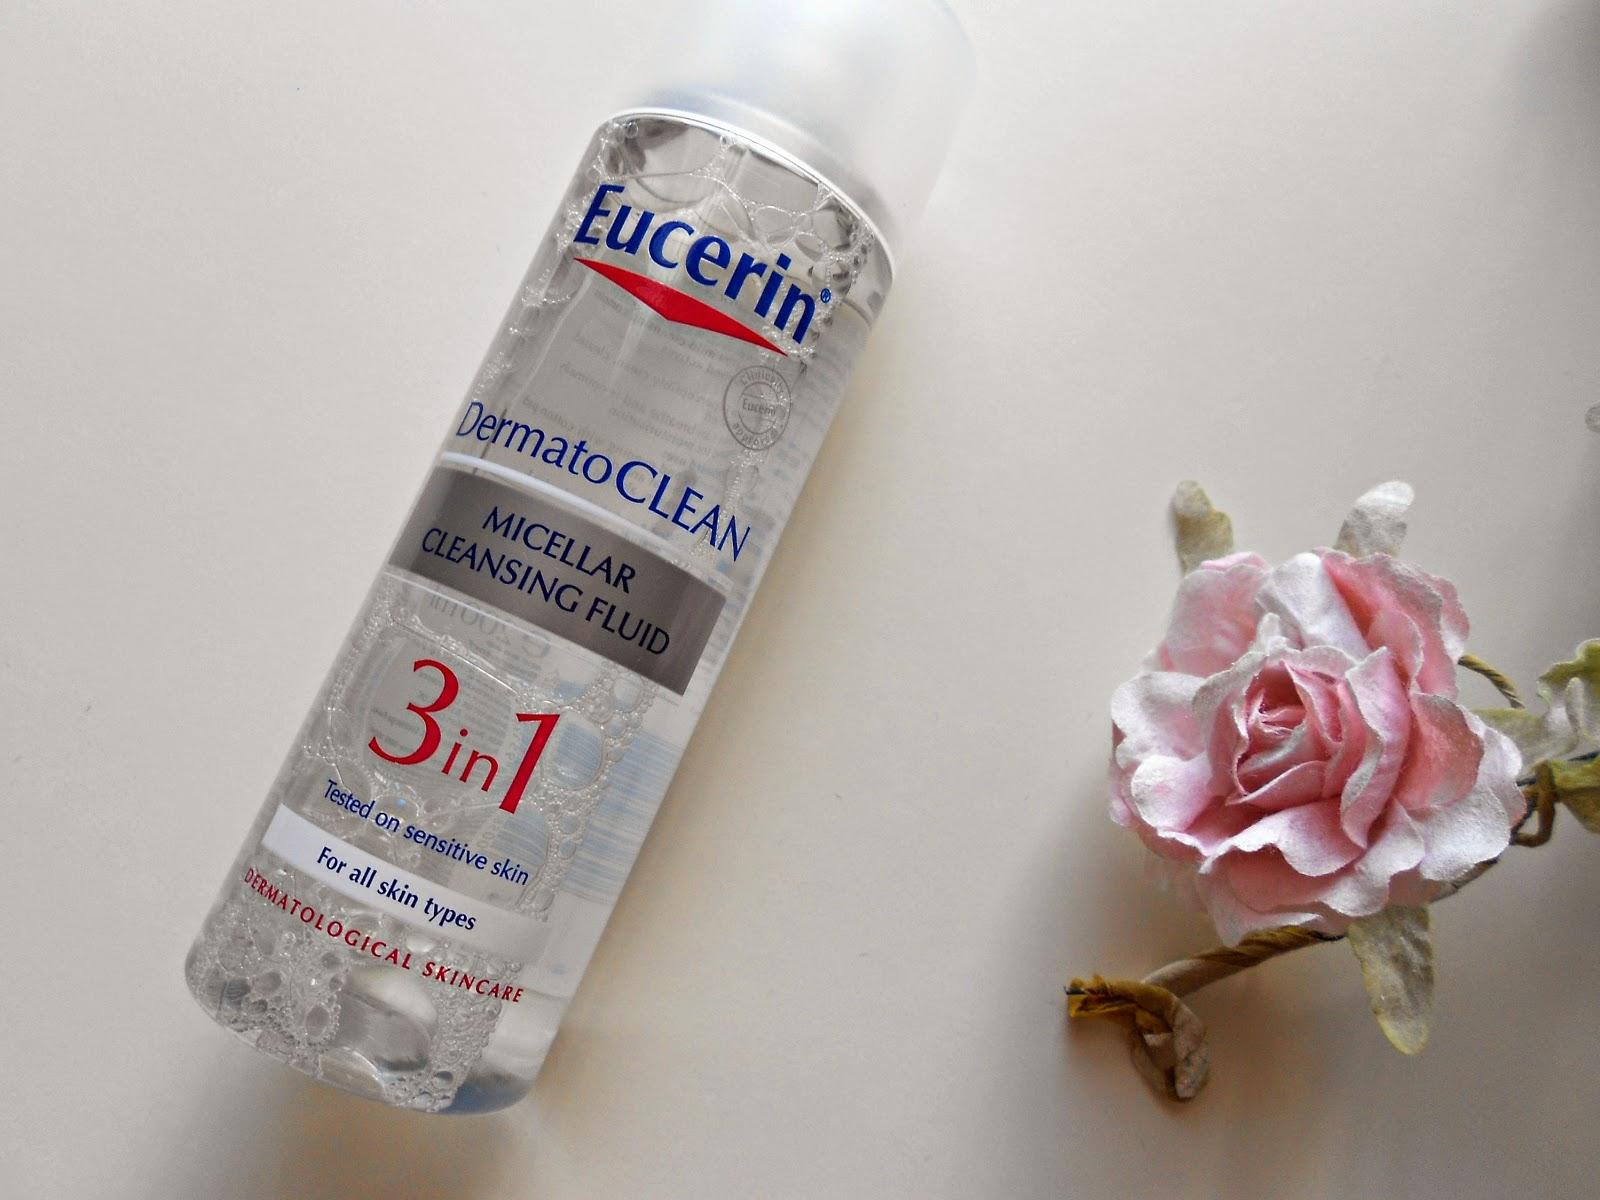 Eucerin Micellar Water